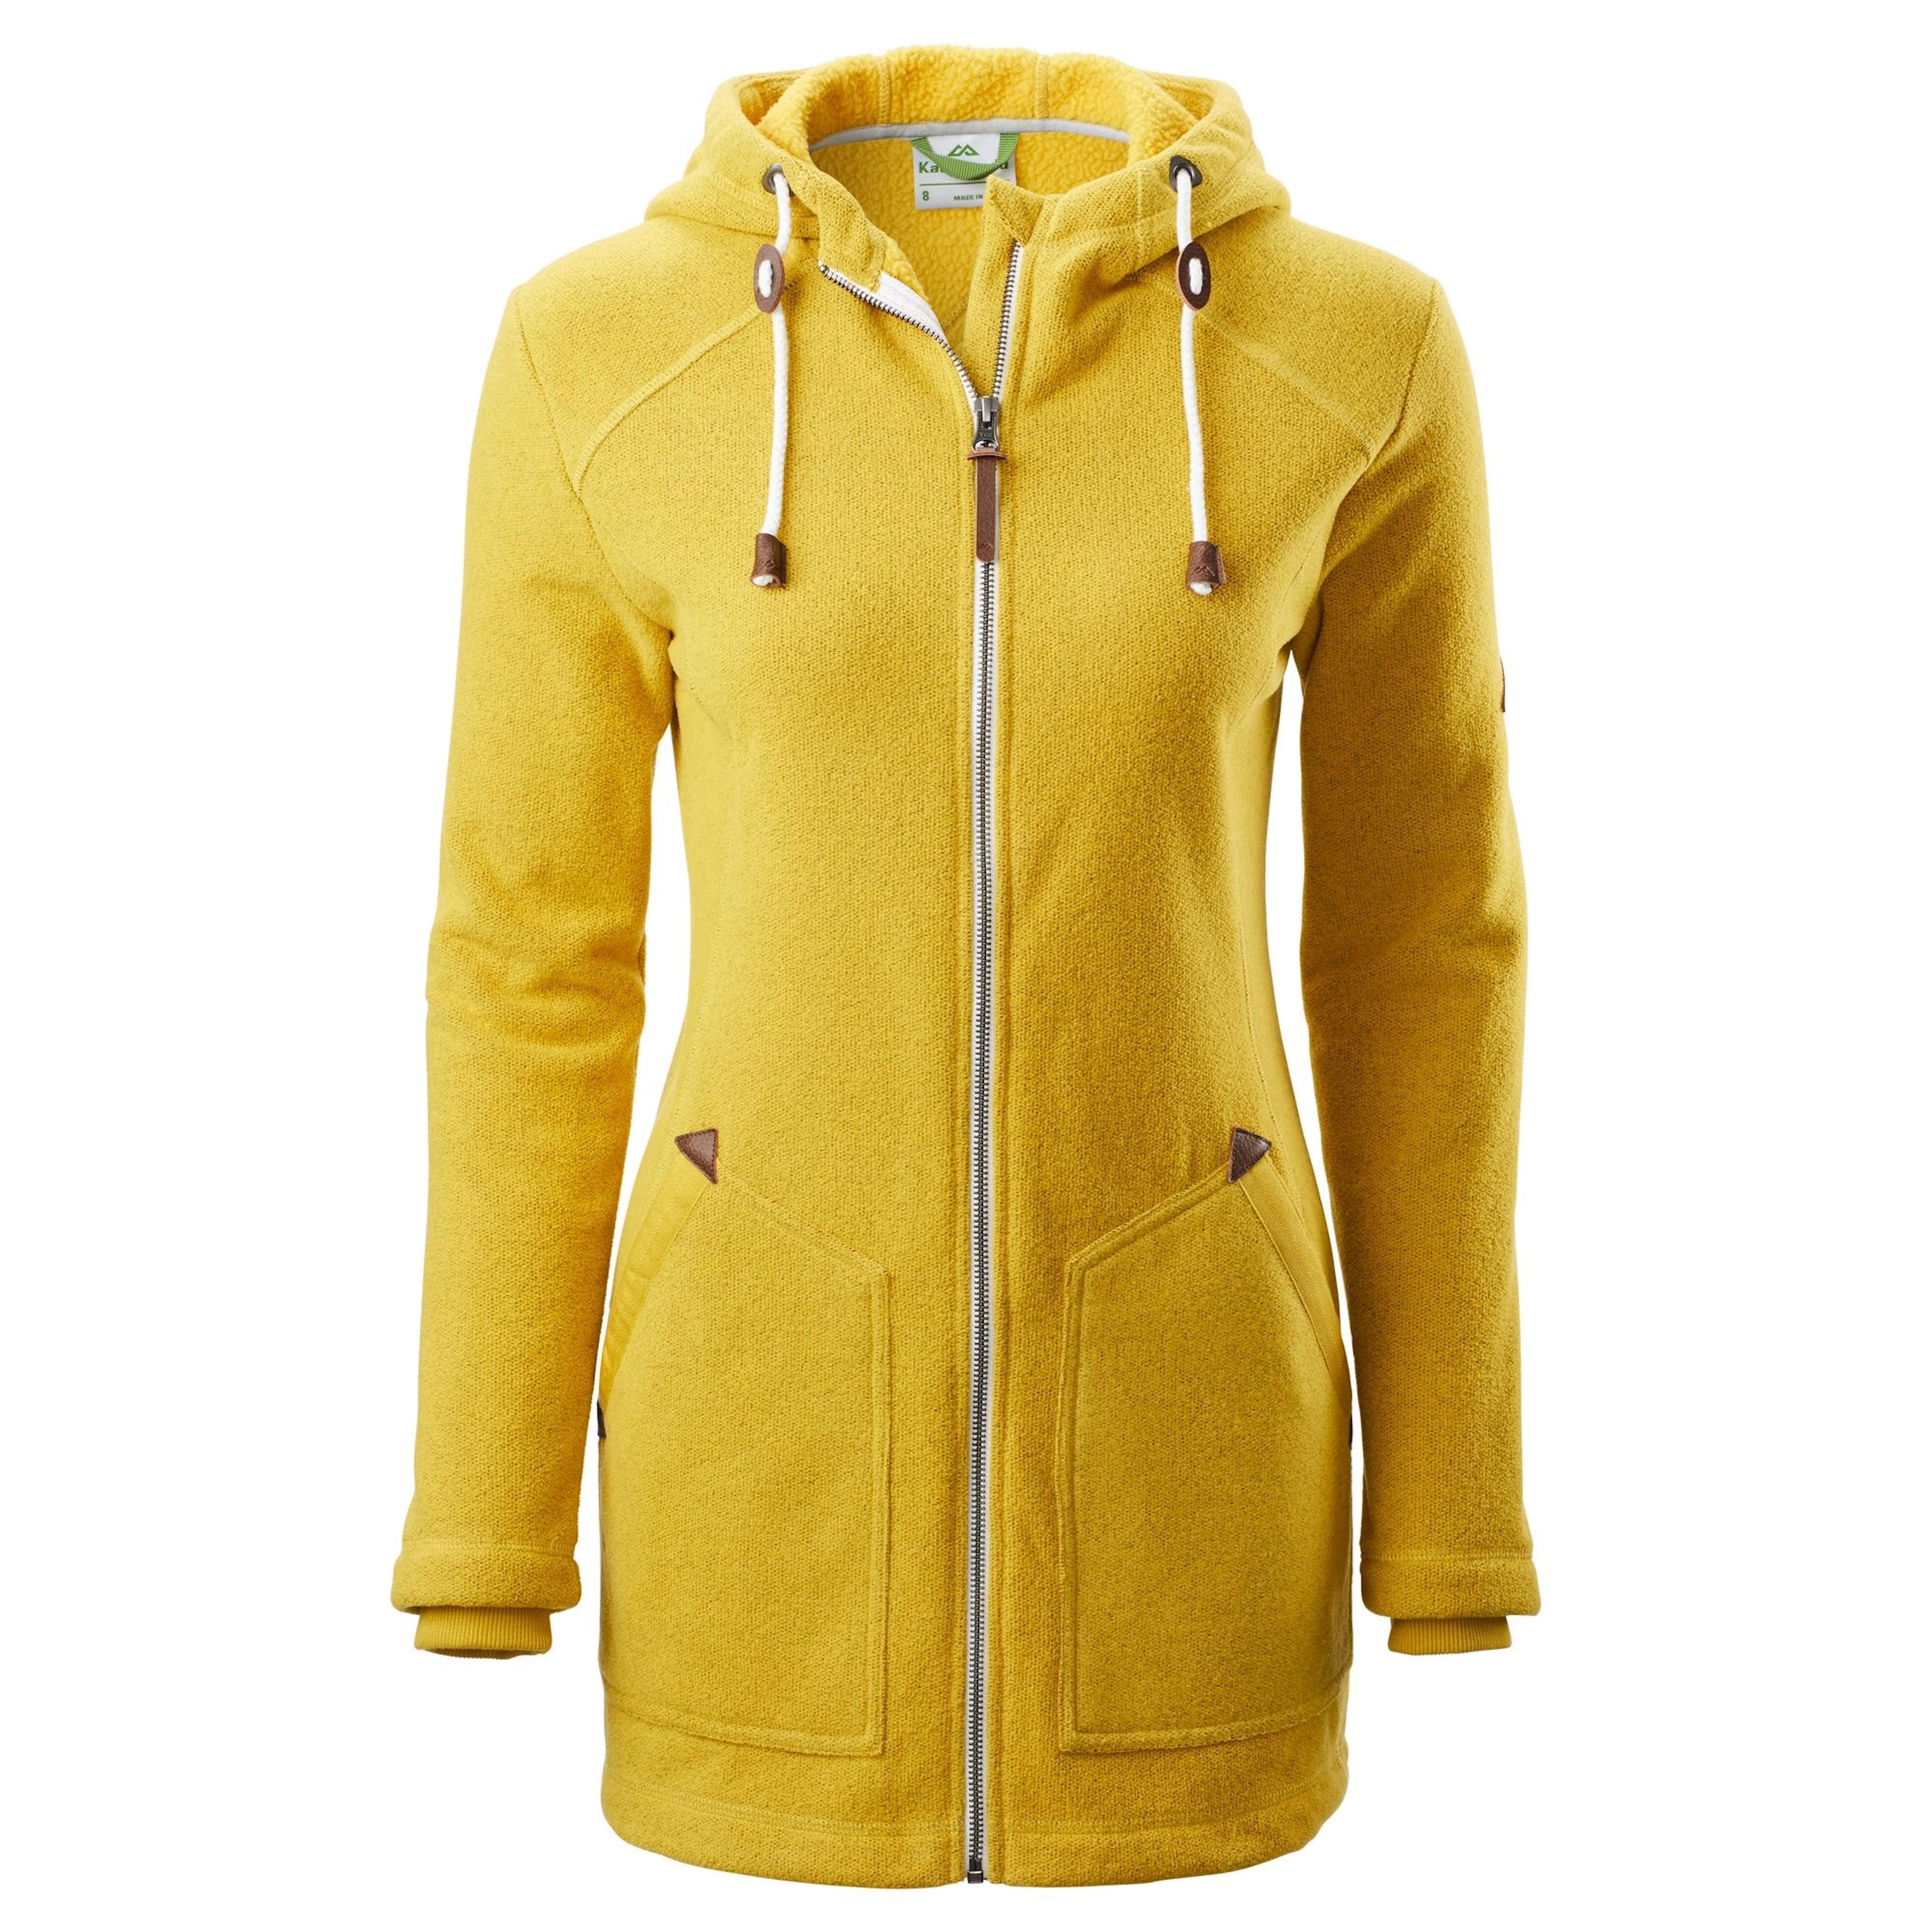 5d9e347c9 Women's Fleece Jackets   Ladies Fleece Coats   Kathmandu NZ